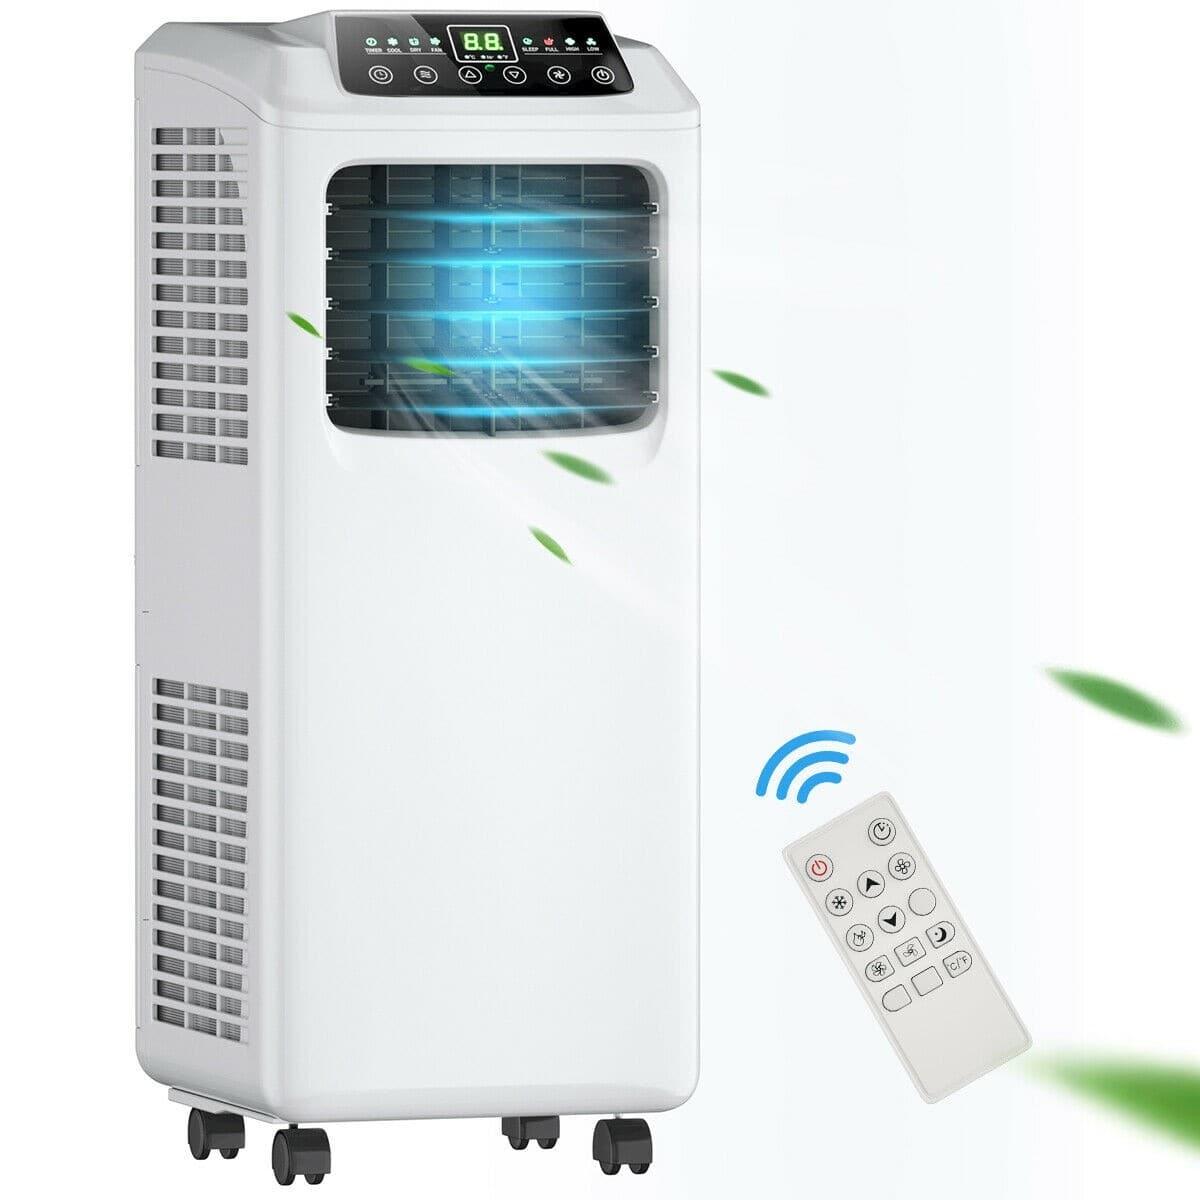 8,000 BTU Portable Air Conditioner $274.95 + FS